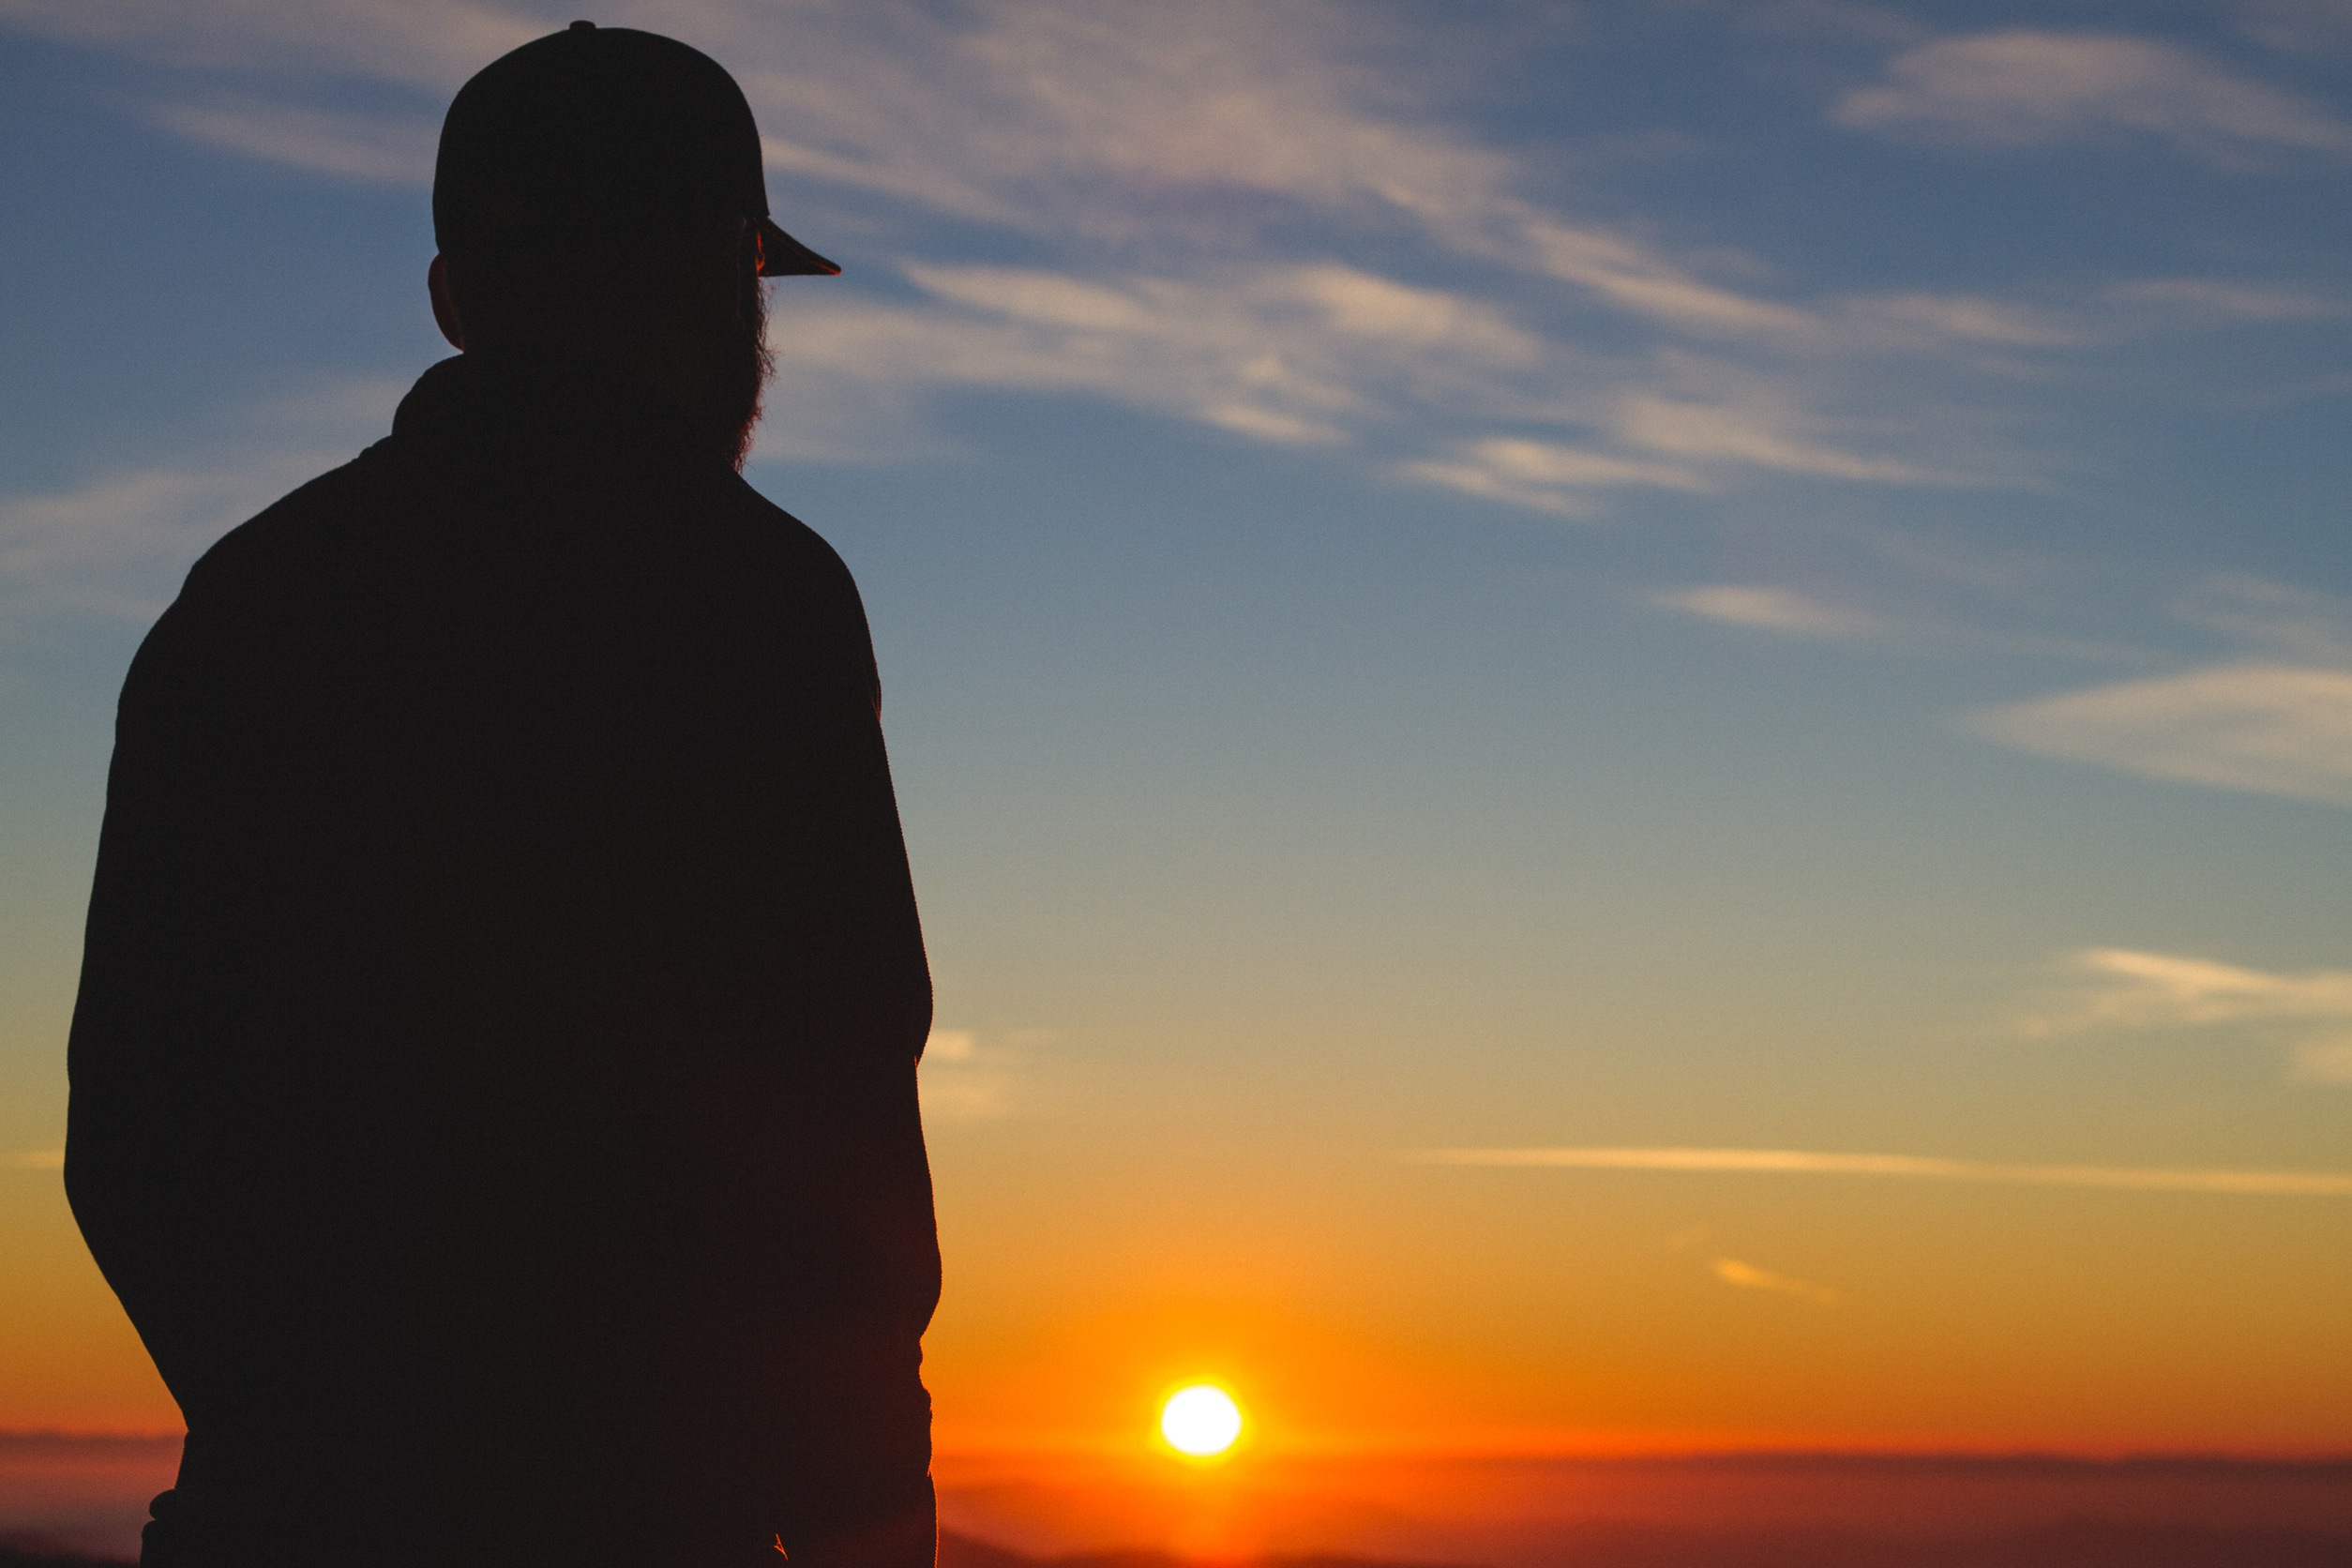 картинки на аву в капюшоне на закате сорта сажают клумбах